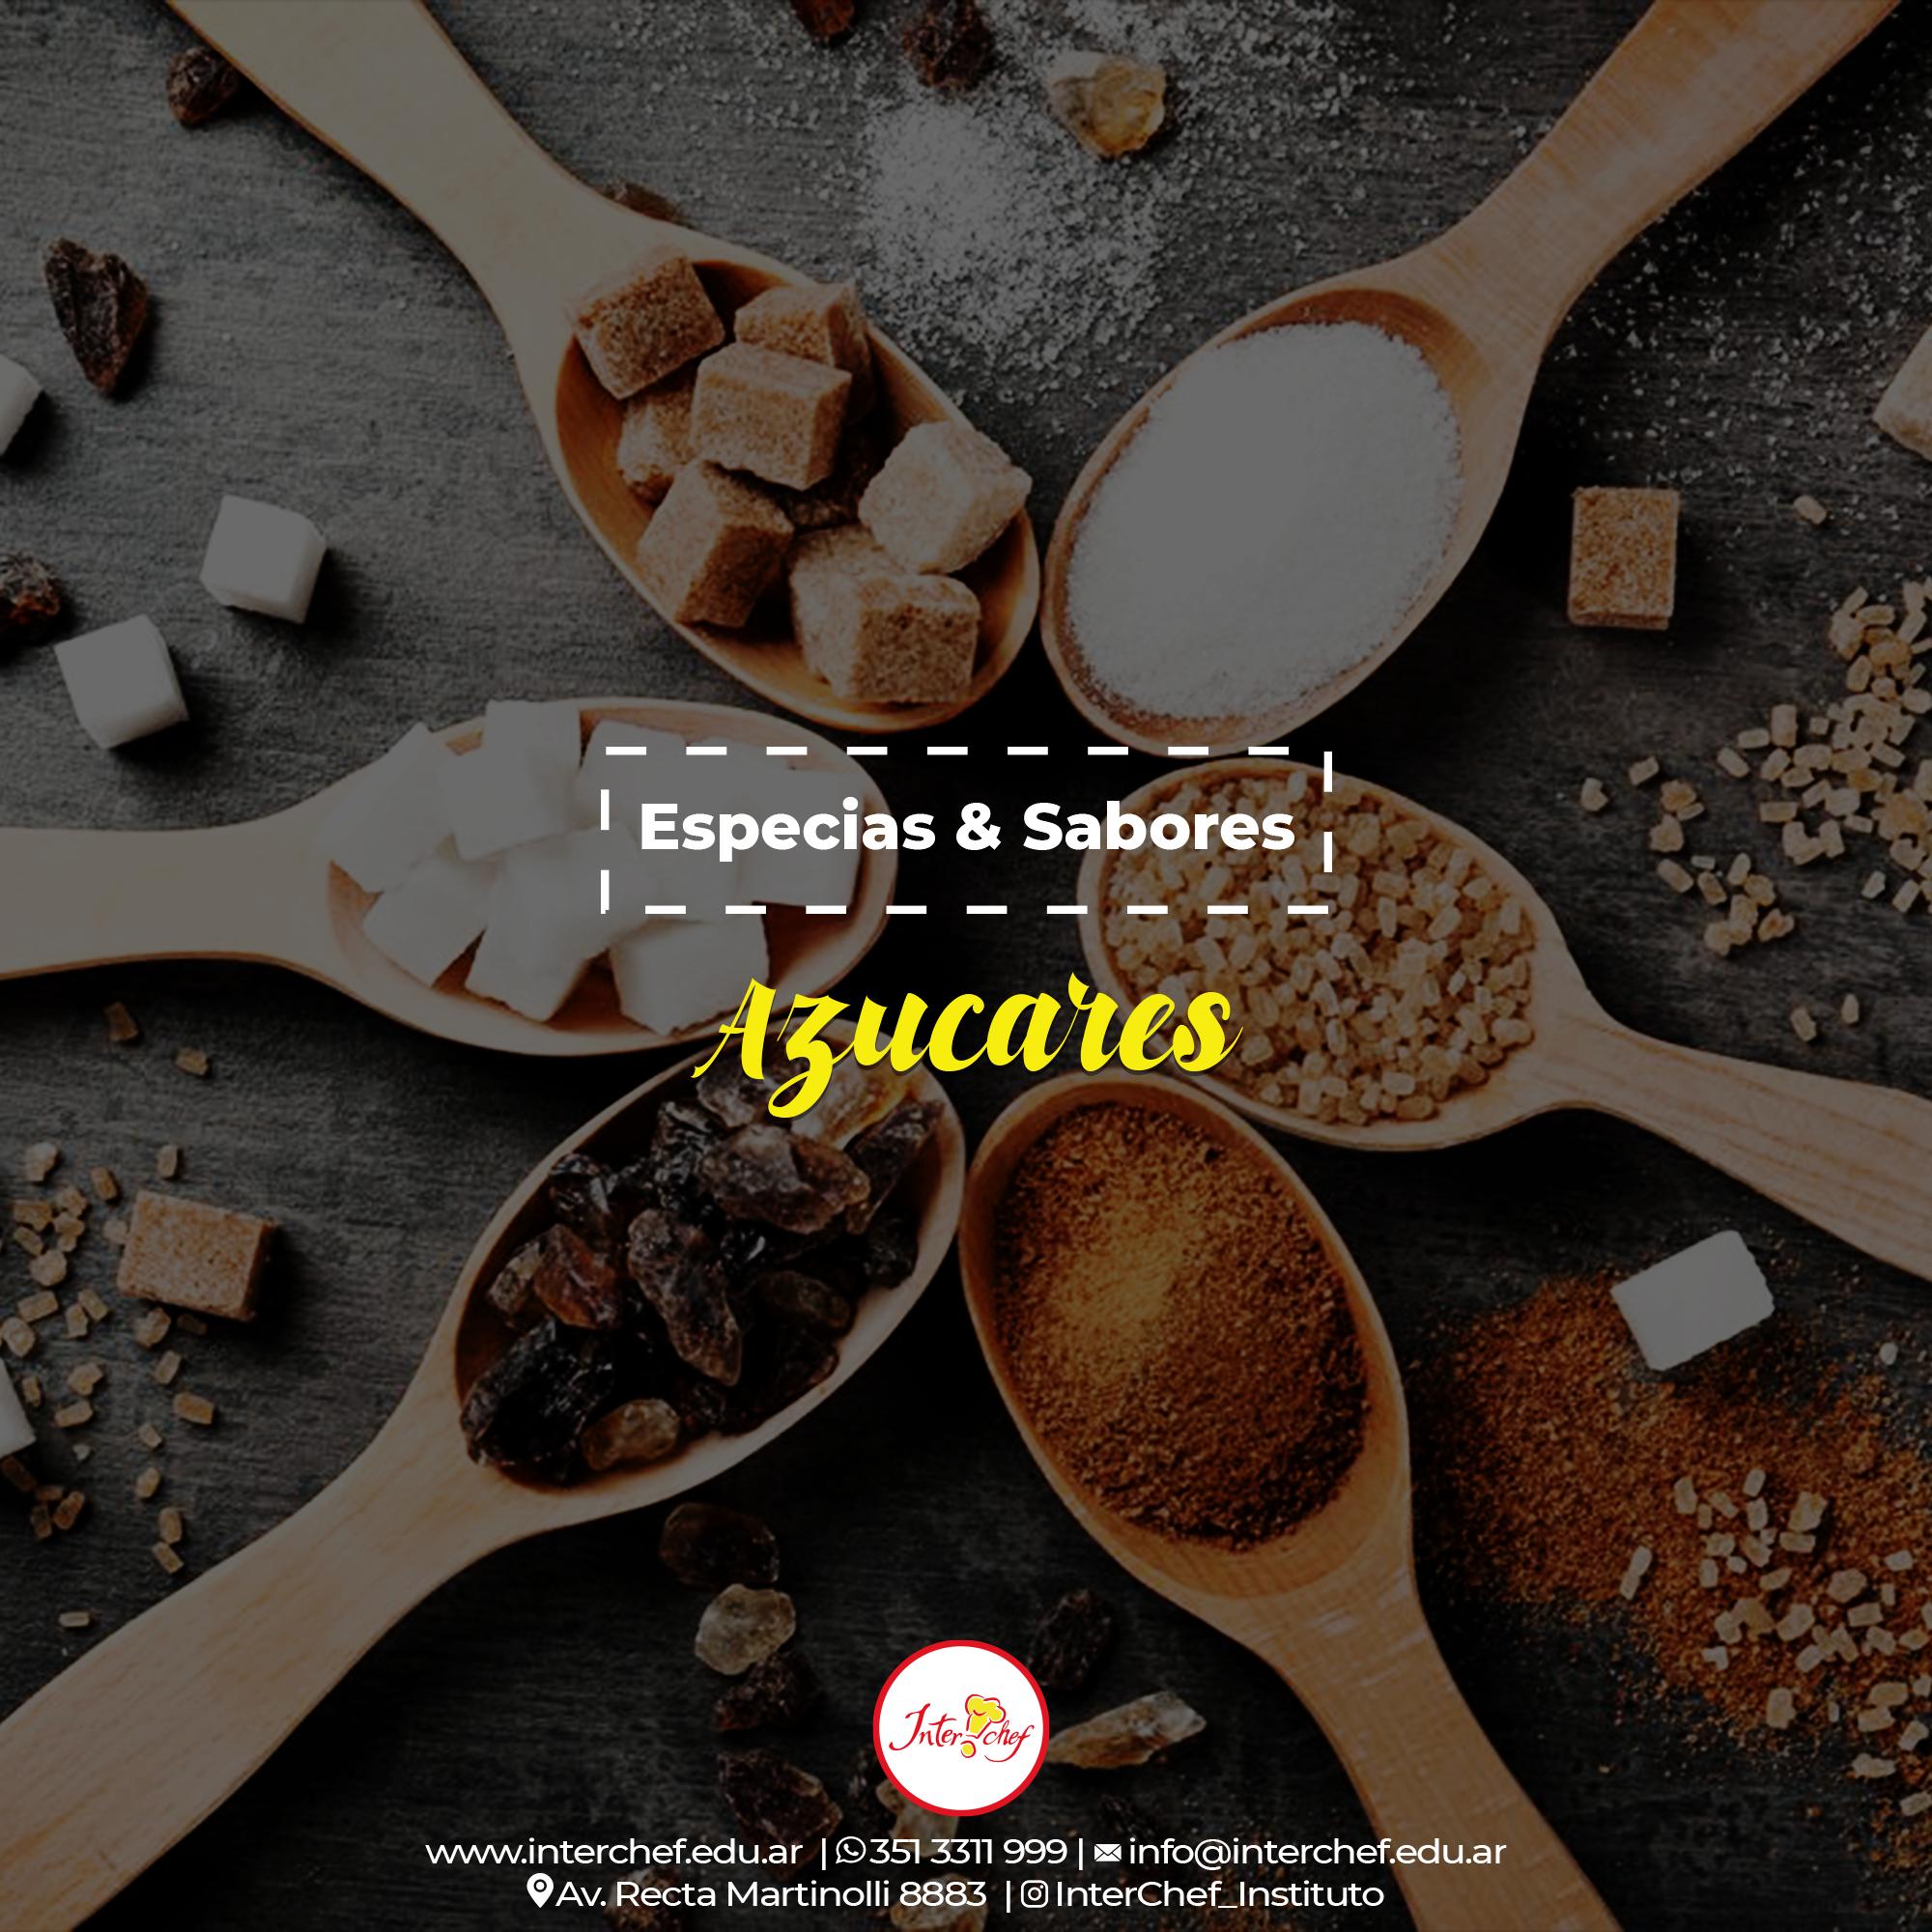 Especias&Sabores: Azúcar